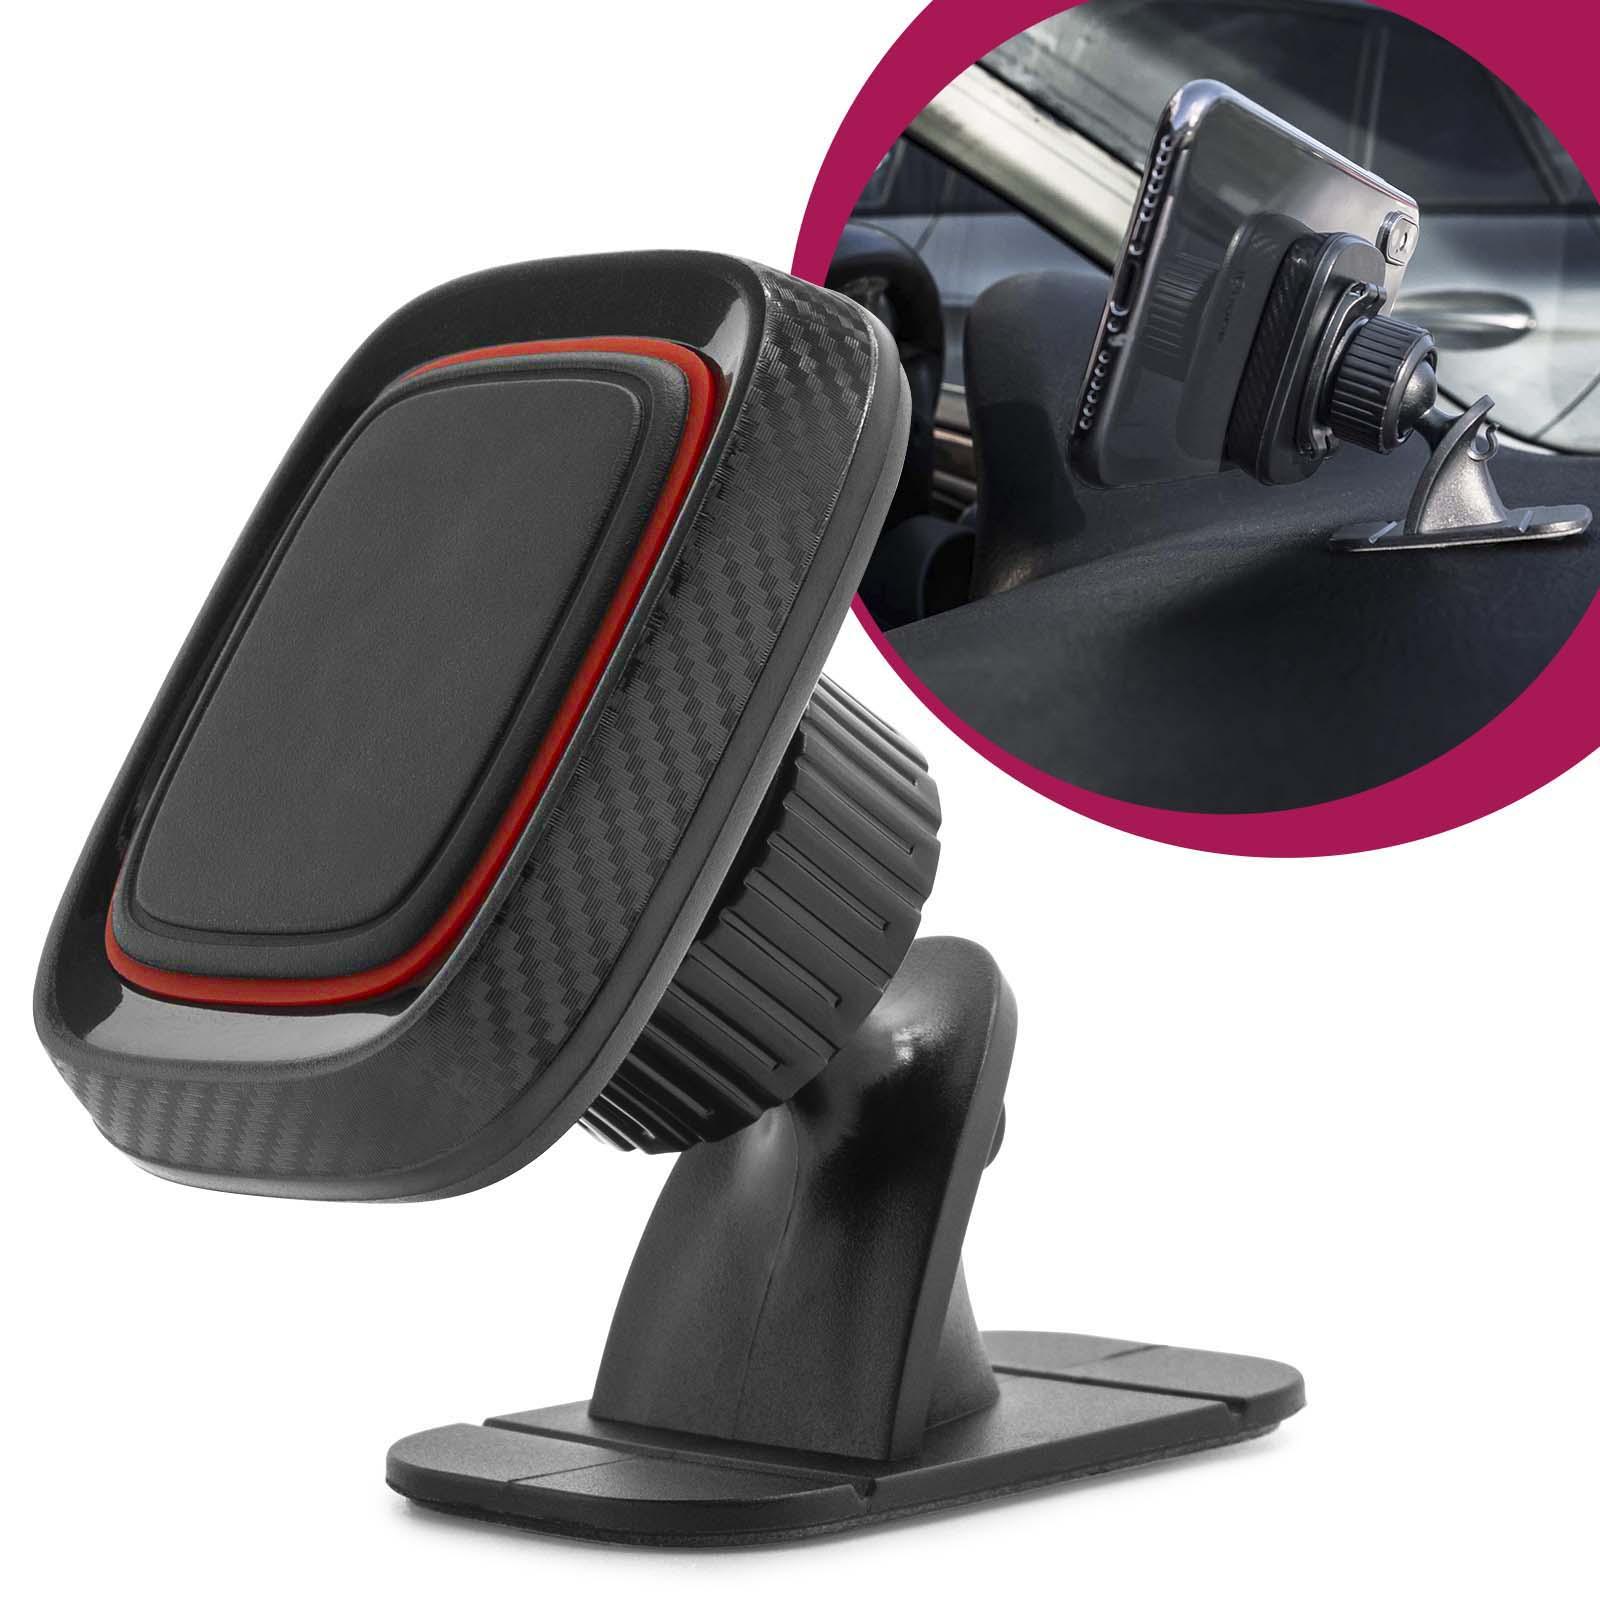 mobilefox universal auto kfz handy halterung carbon optik. Black Bedroom Furniture Sets. Home Design Ideas